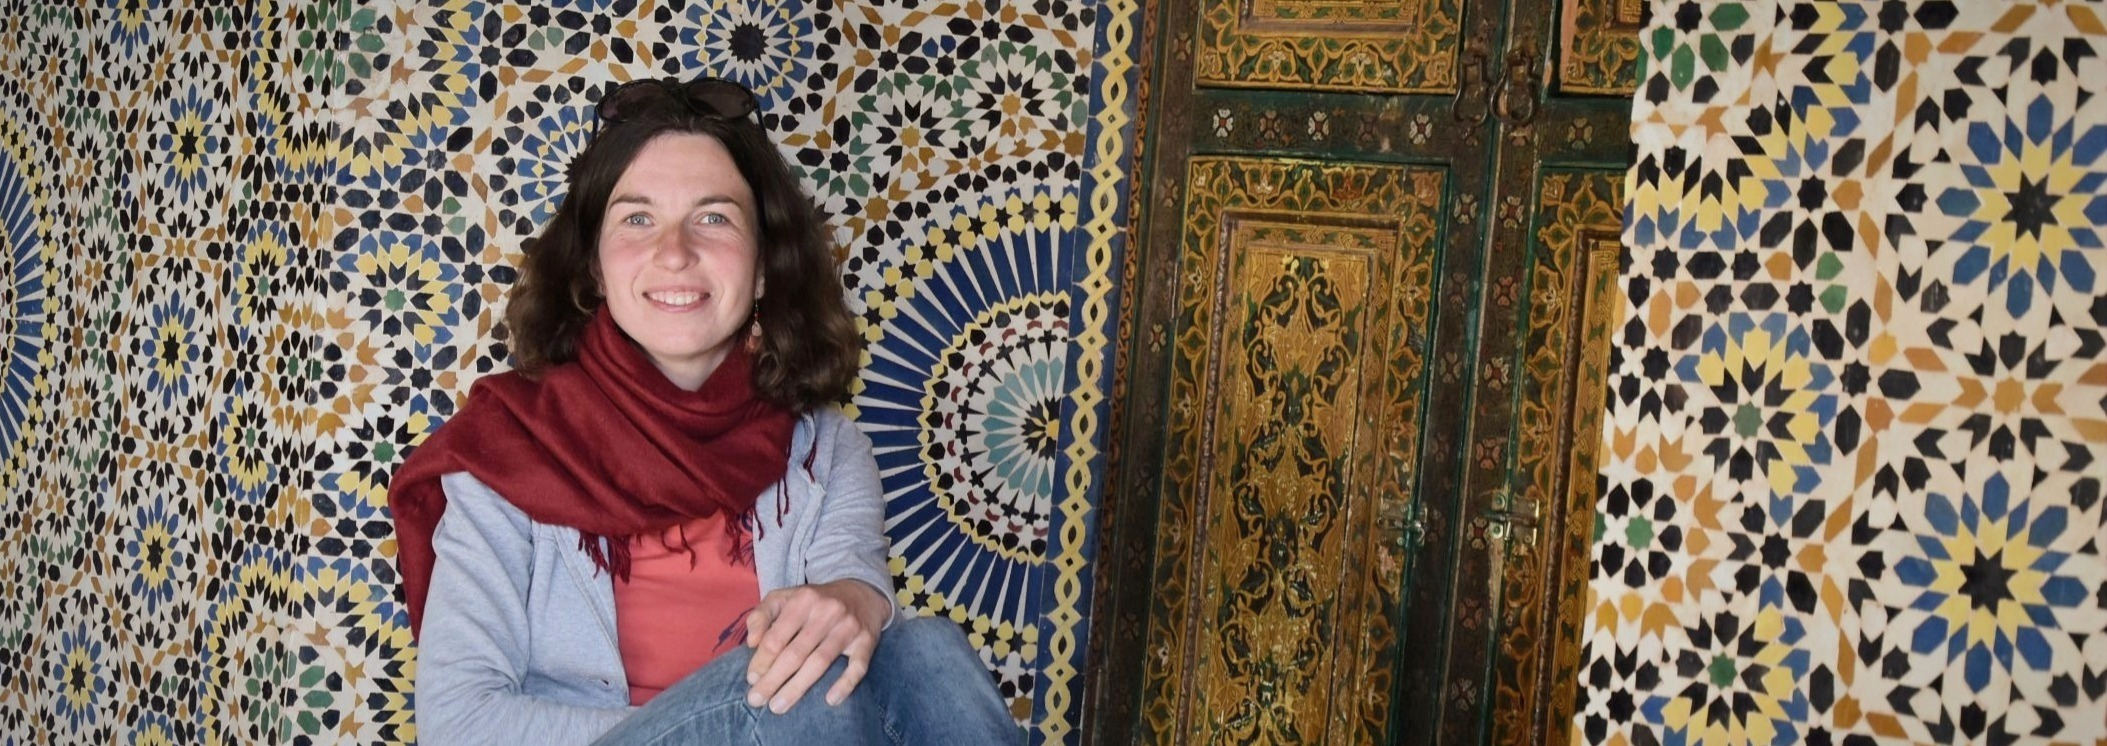 Tereza Huclova sedici pred barevnou marockou mozaikou